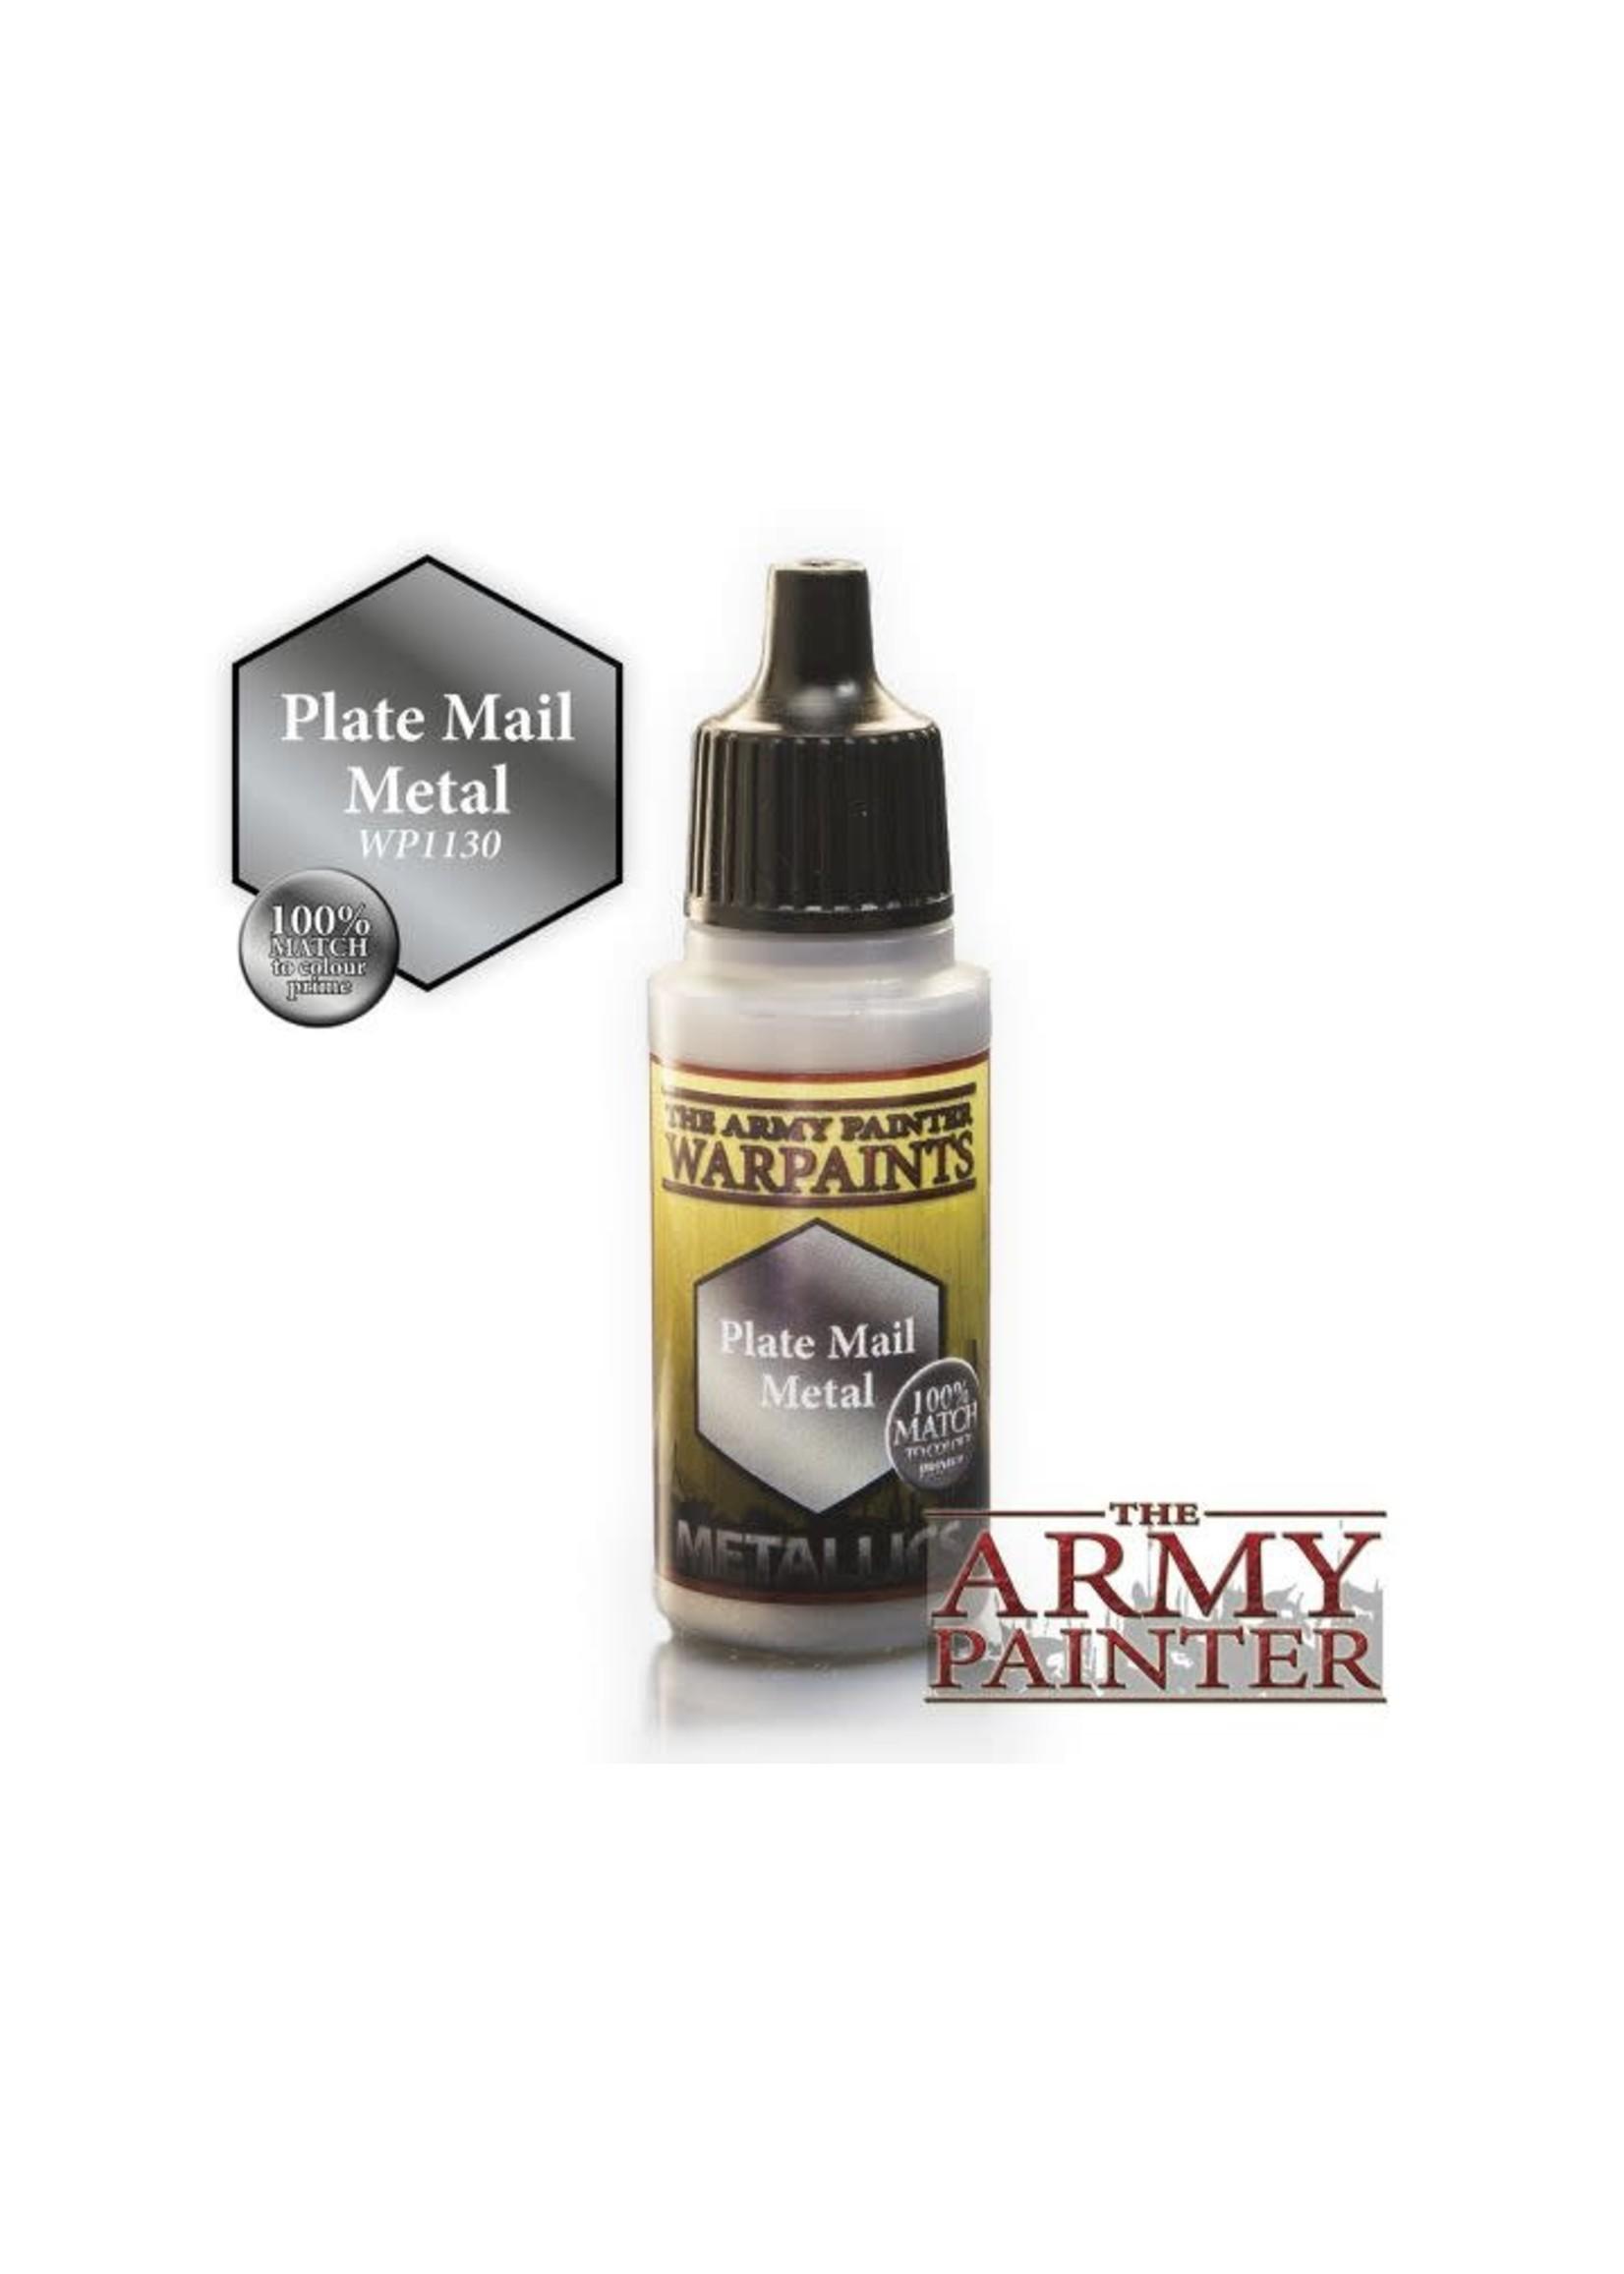 Army Painter Warpaints - Plate Mail Metal